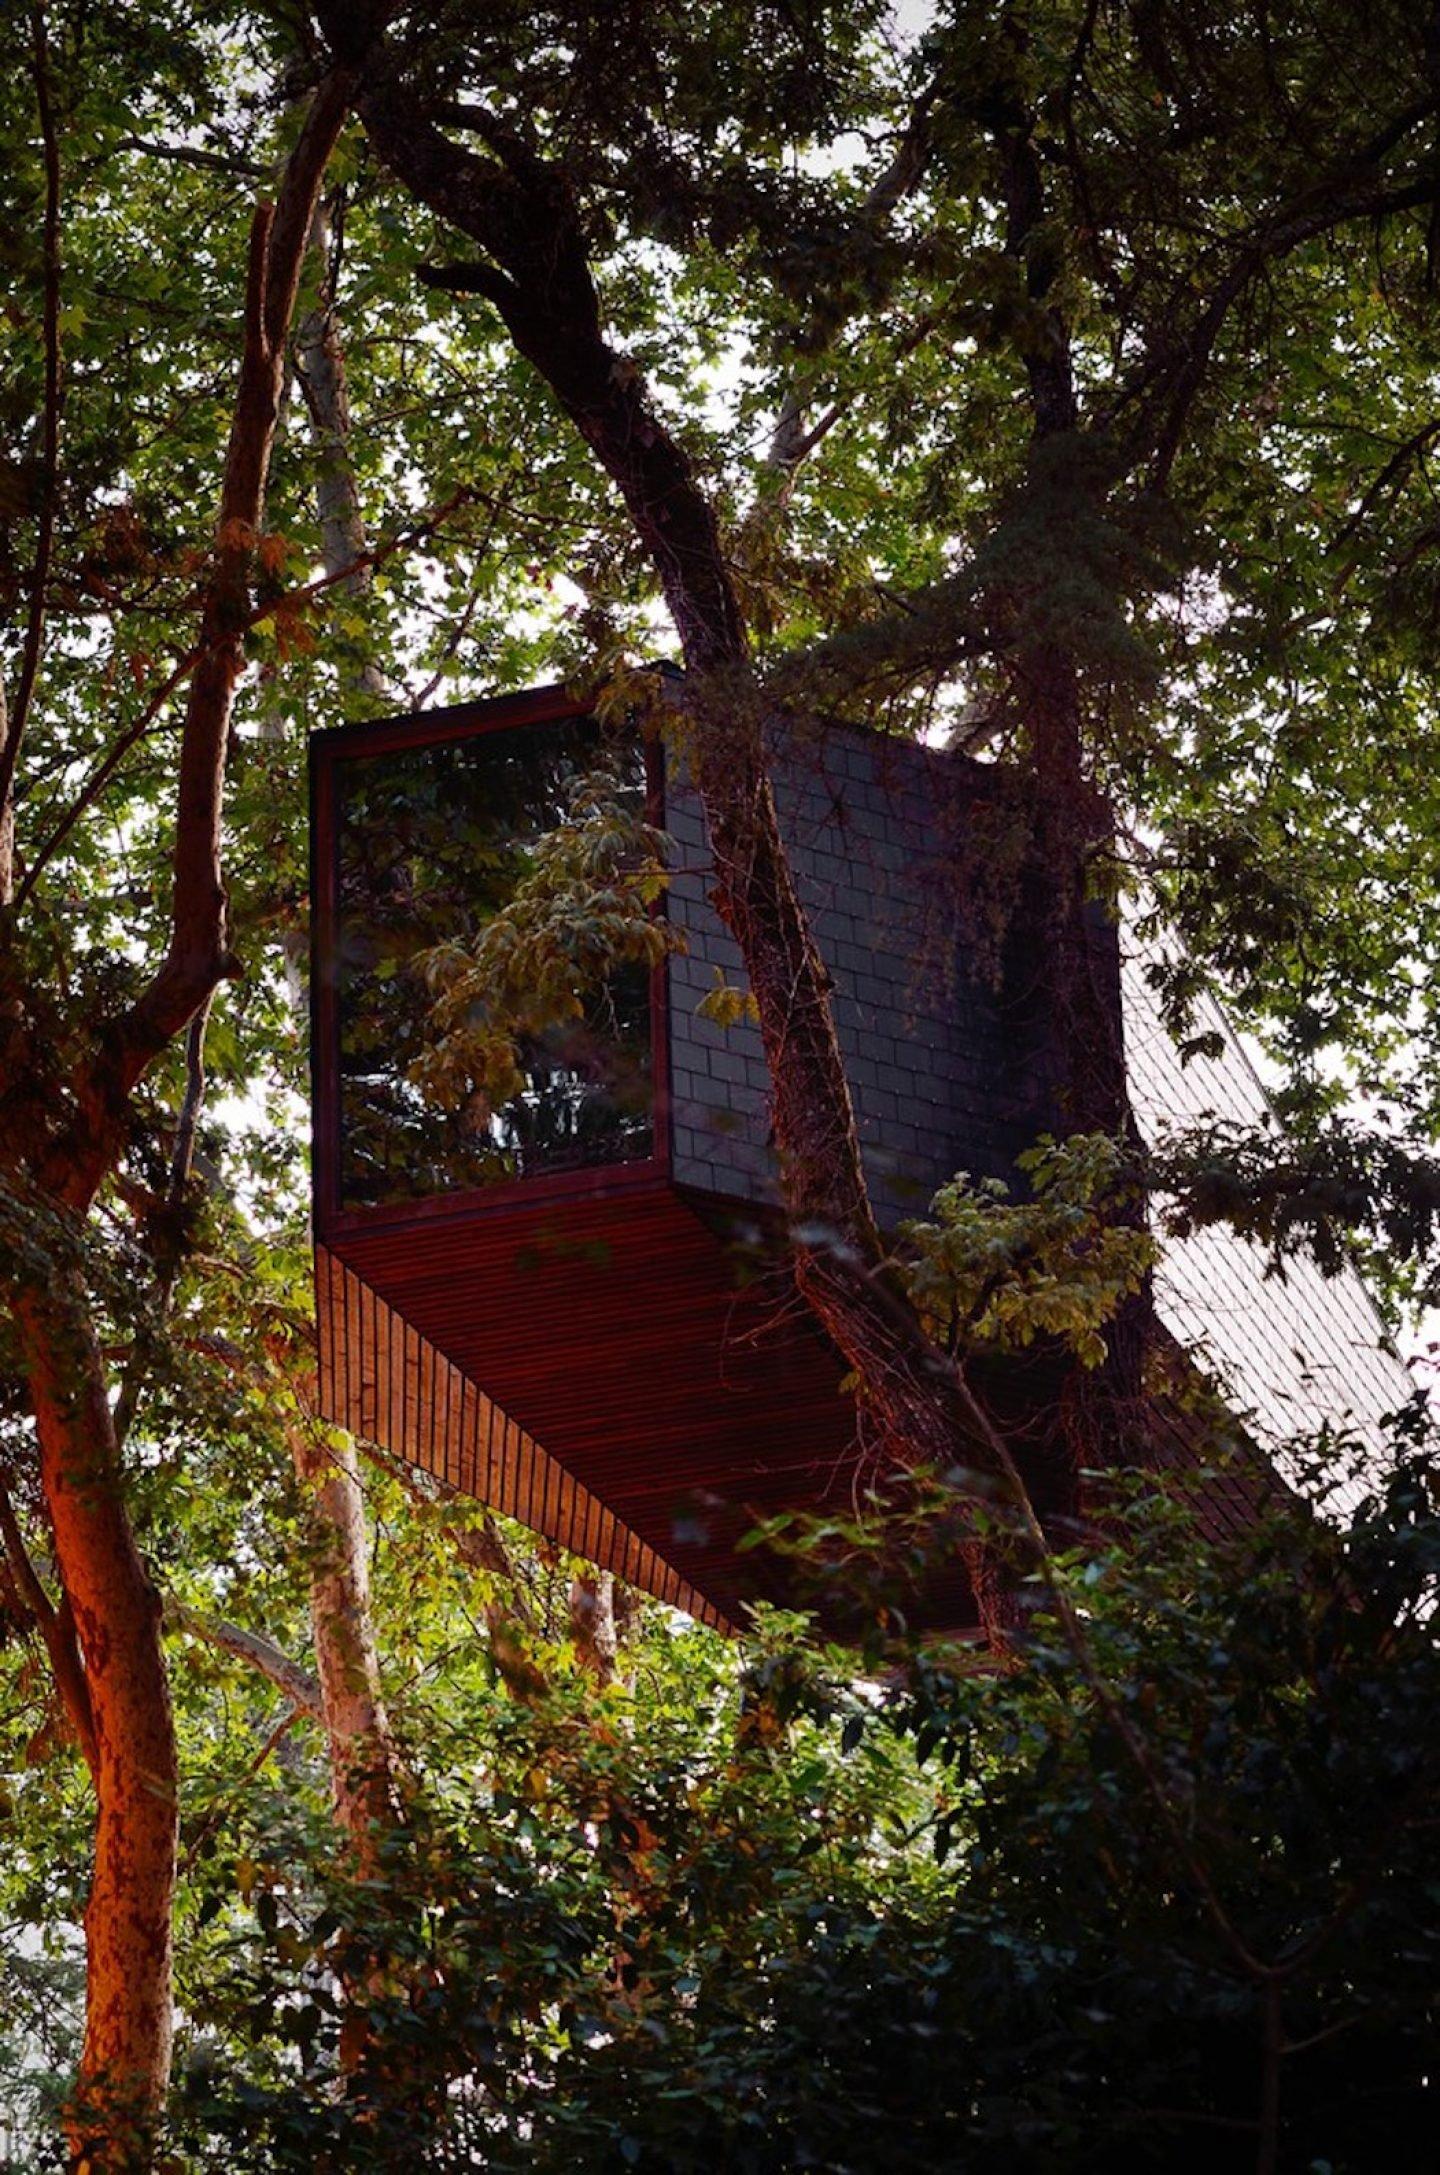 TREE_SNAKE_HOUSE_2094